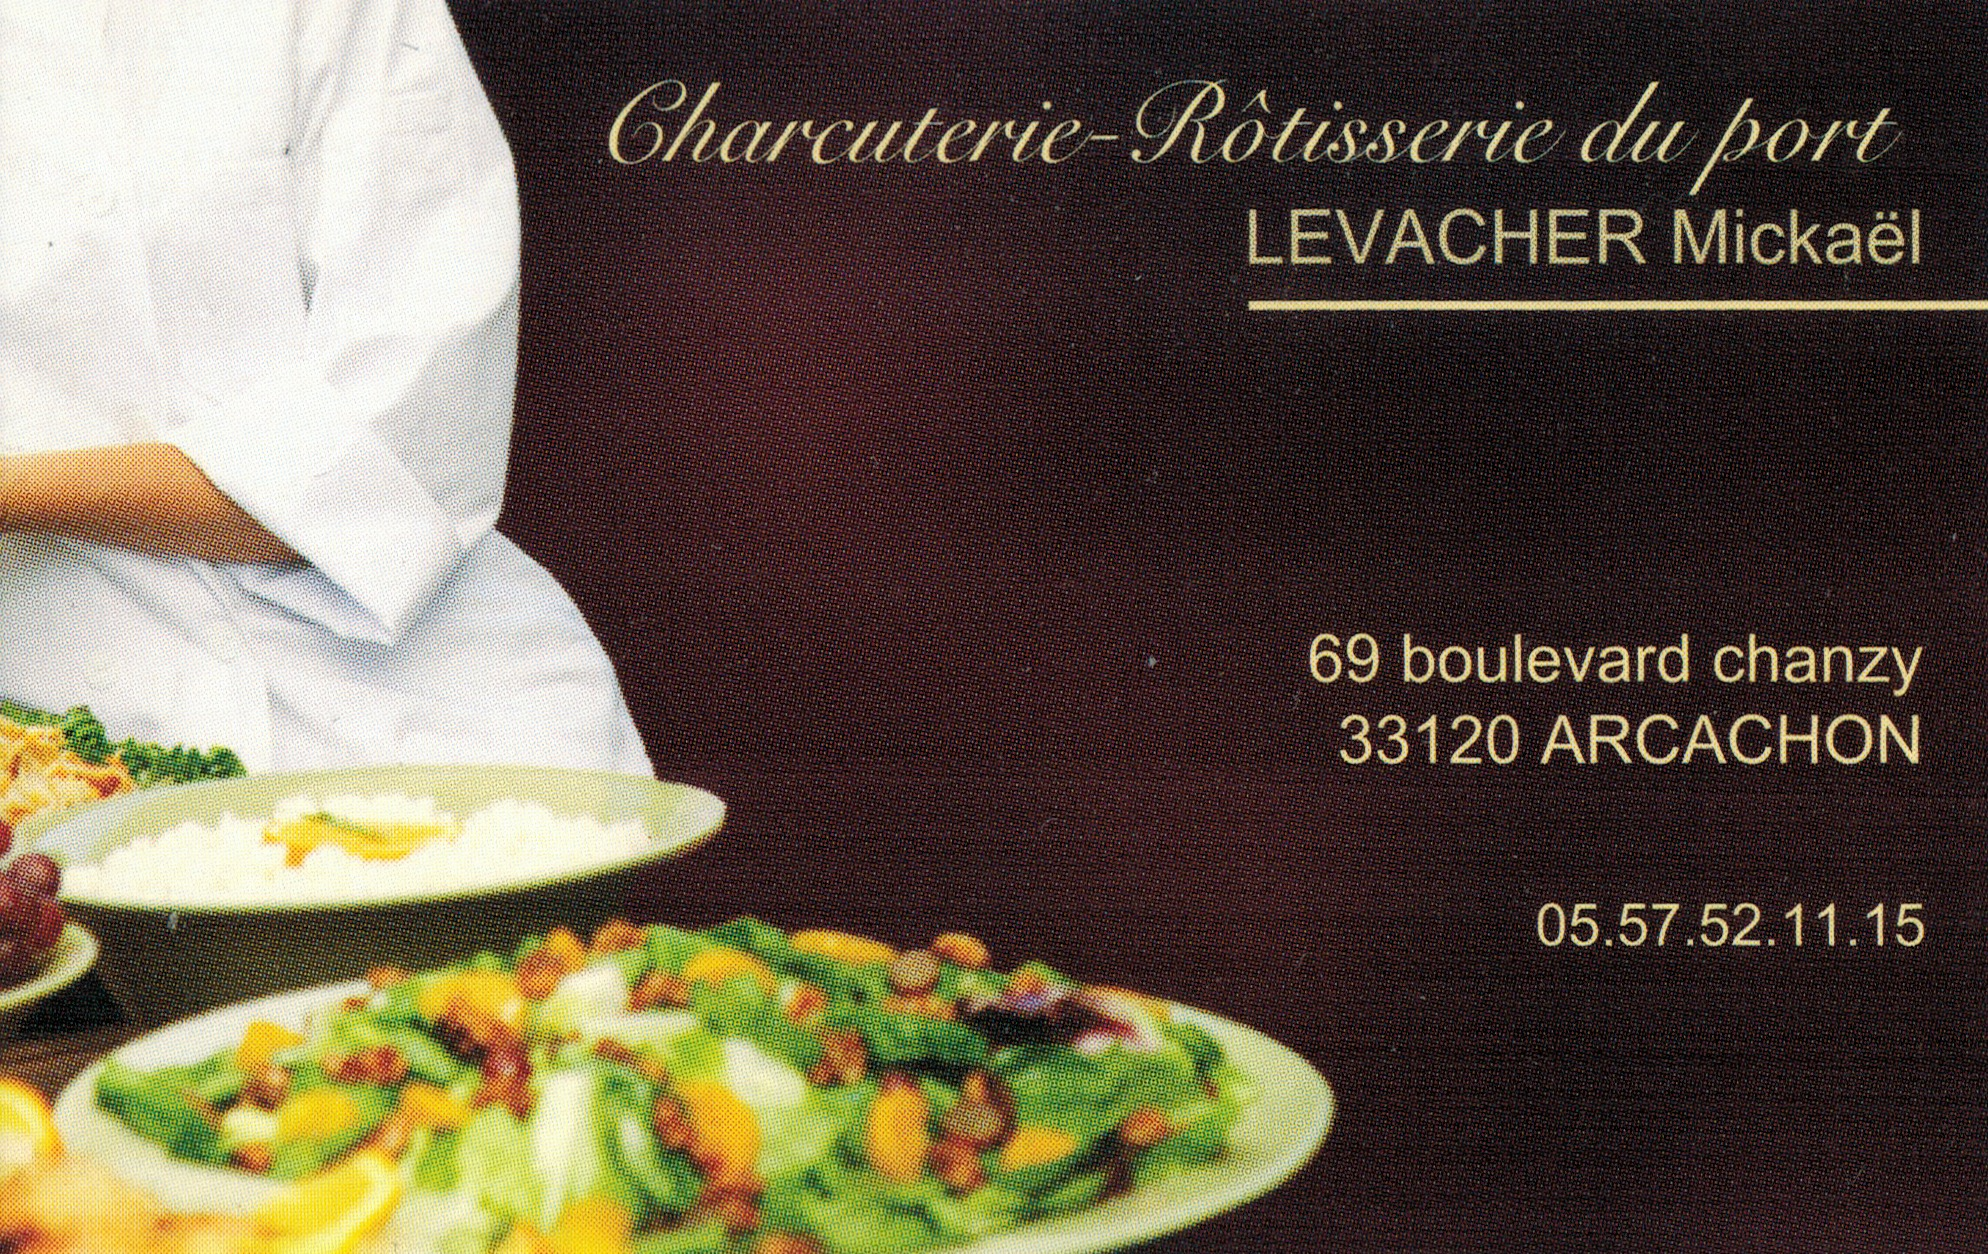 Charcuterie - Rôtisserie du port / LEVAHCER Mickaël